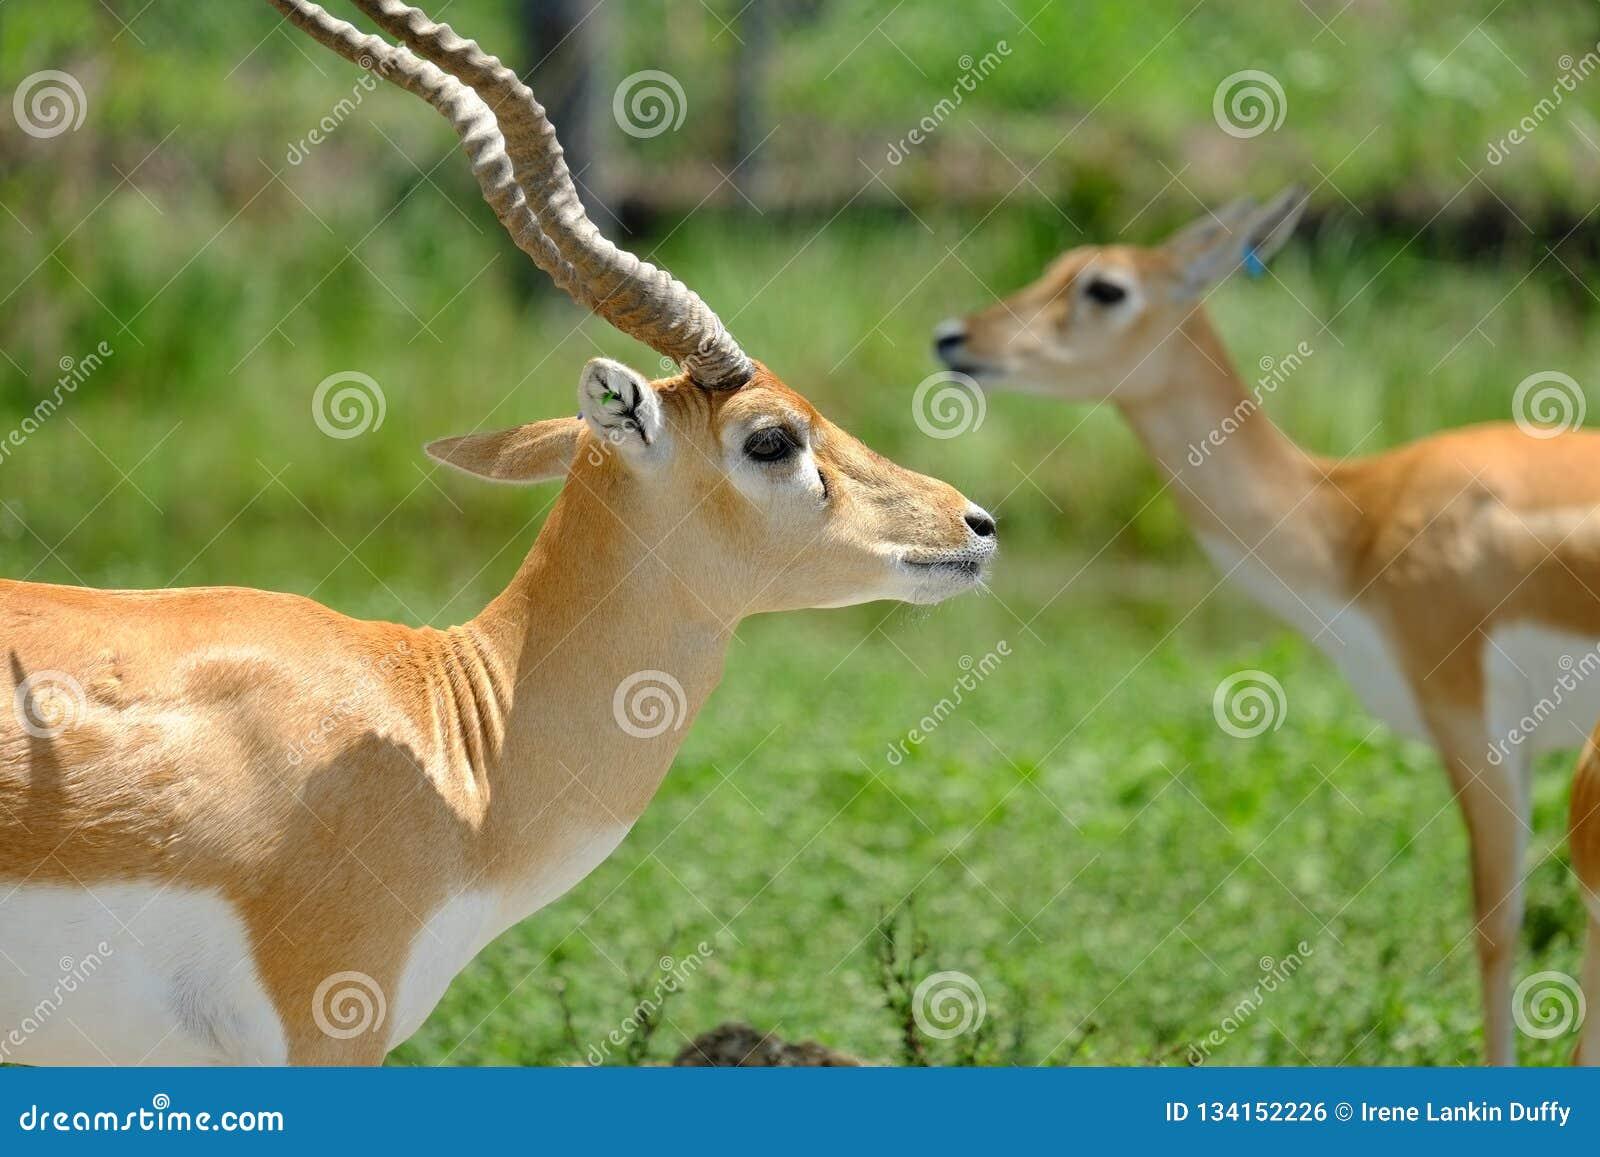 Gazelles: Close-up view